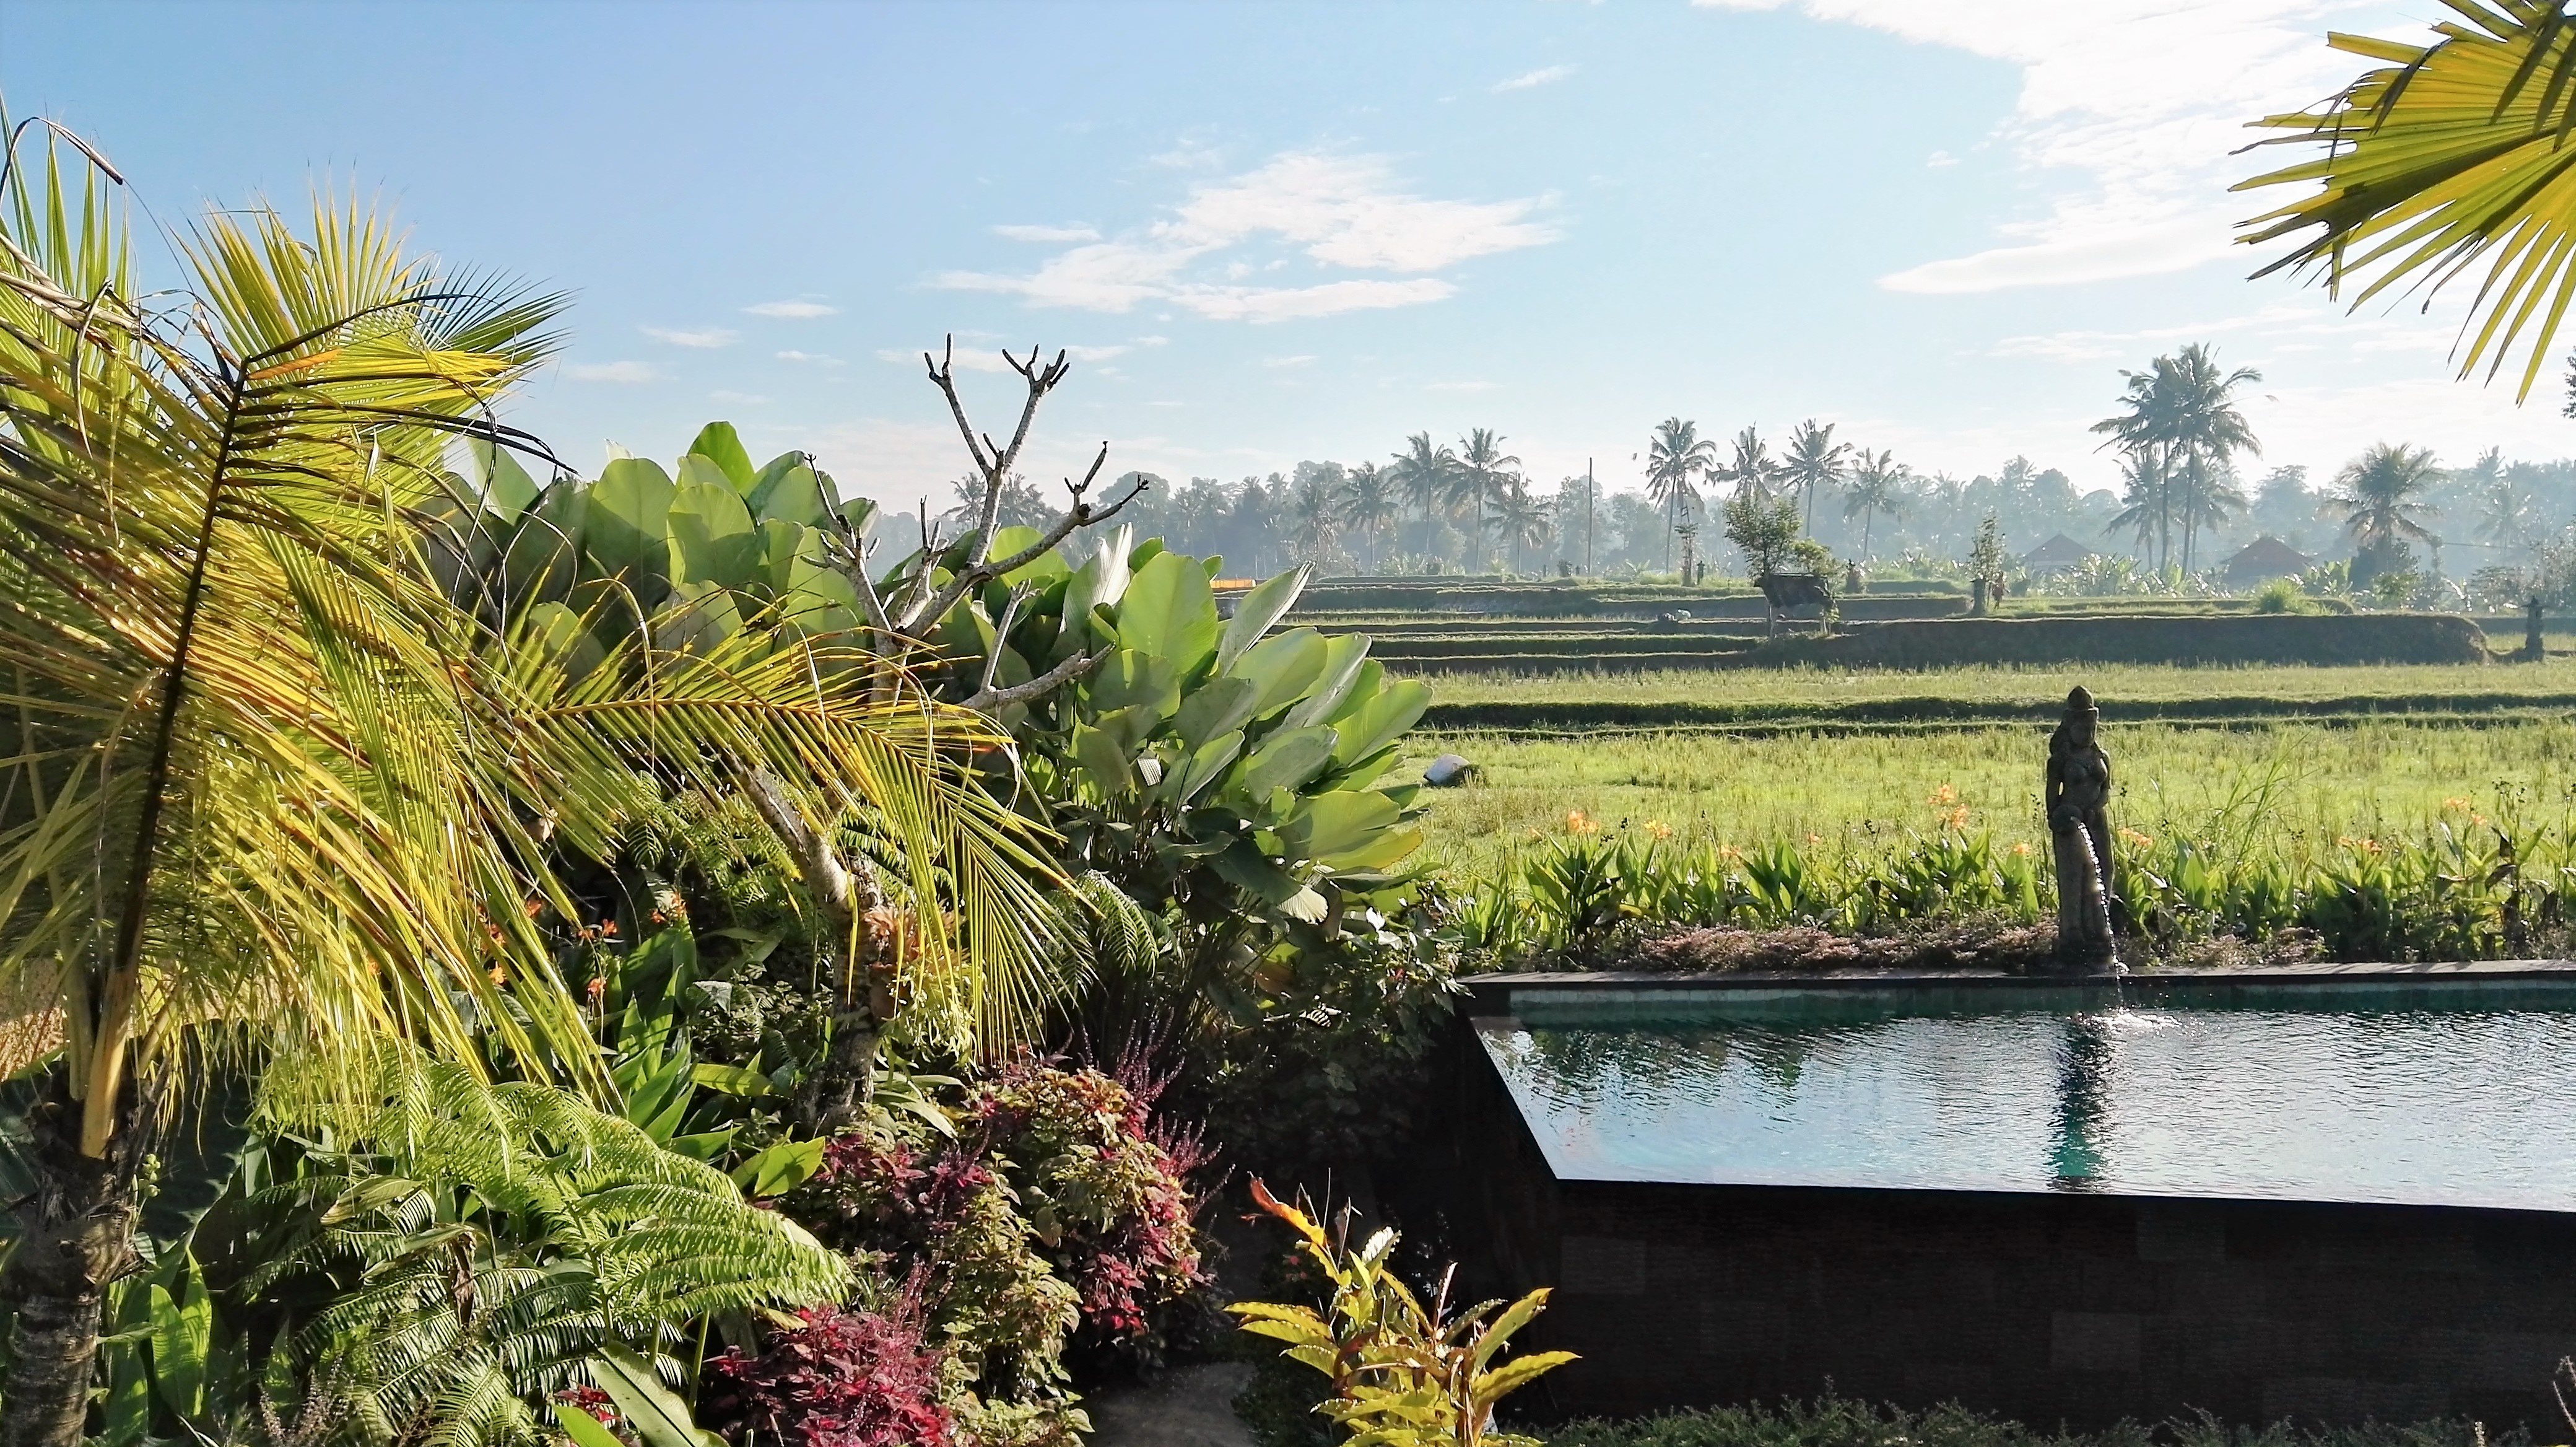 Bali Ubud Padi Bali Eco Villas Lemonandjuice (23).jpg